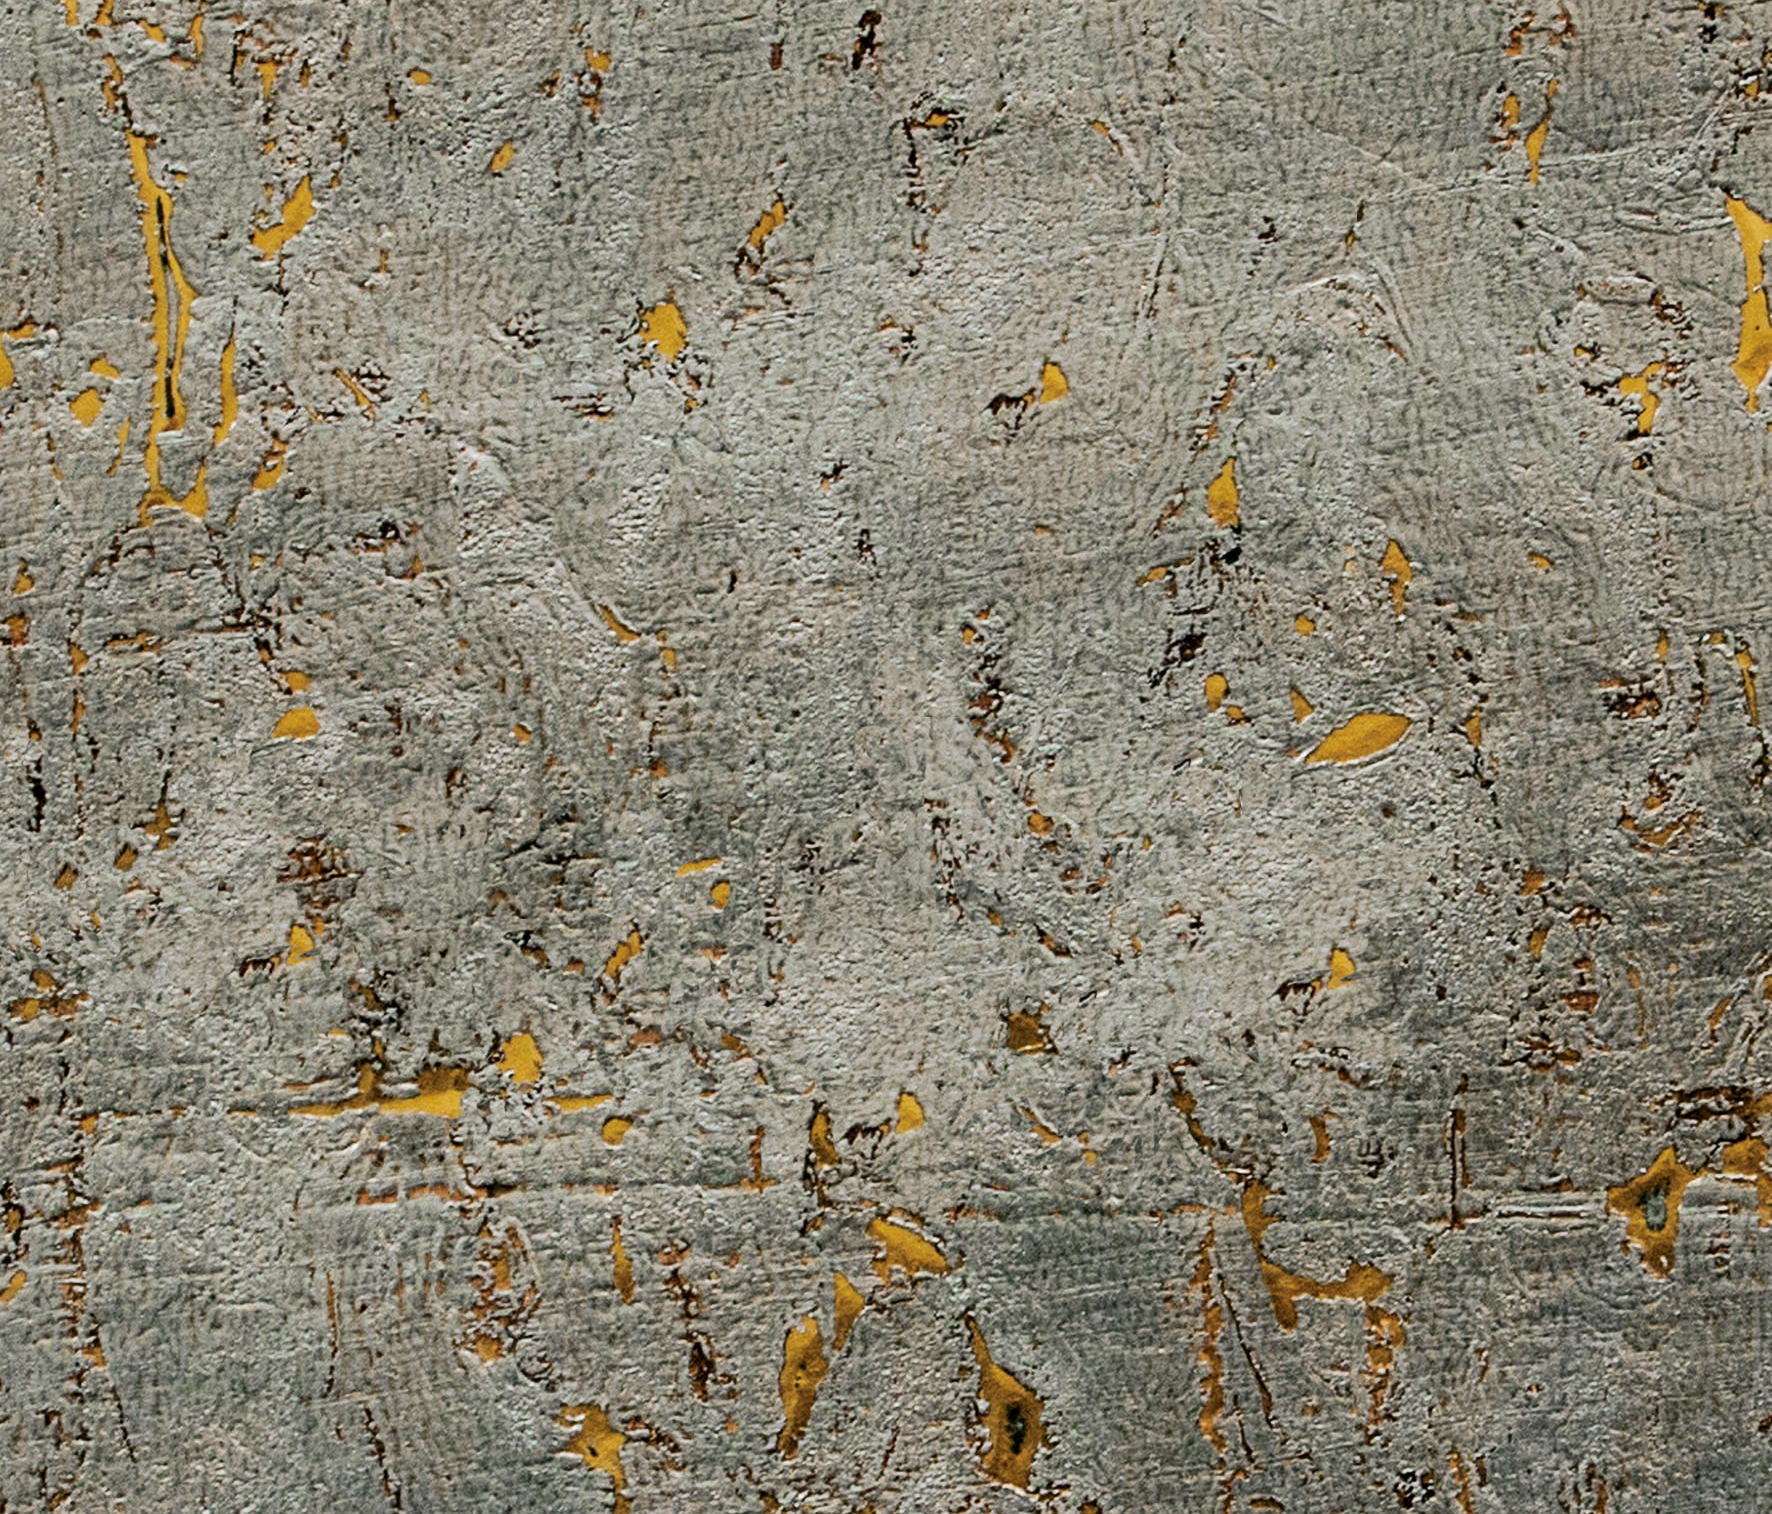 clat li ge mural rm 631 82 wall coverings. Black Bedroom Furniture Sets. Home Design Ideas